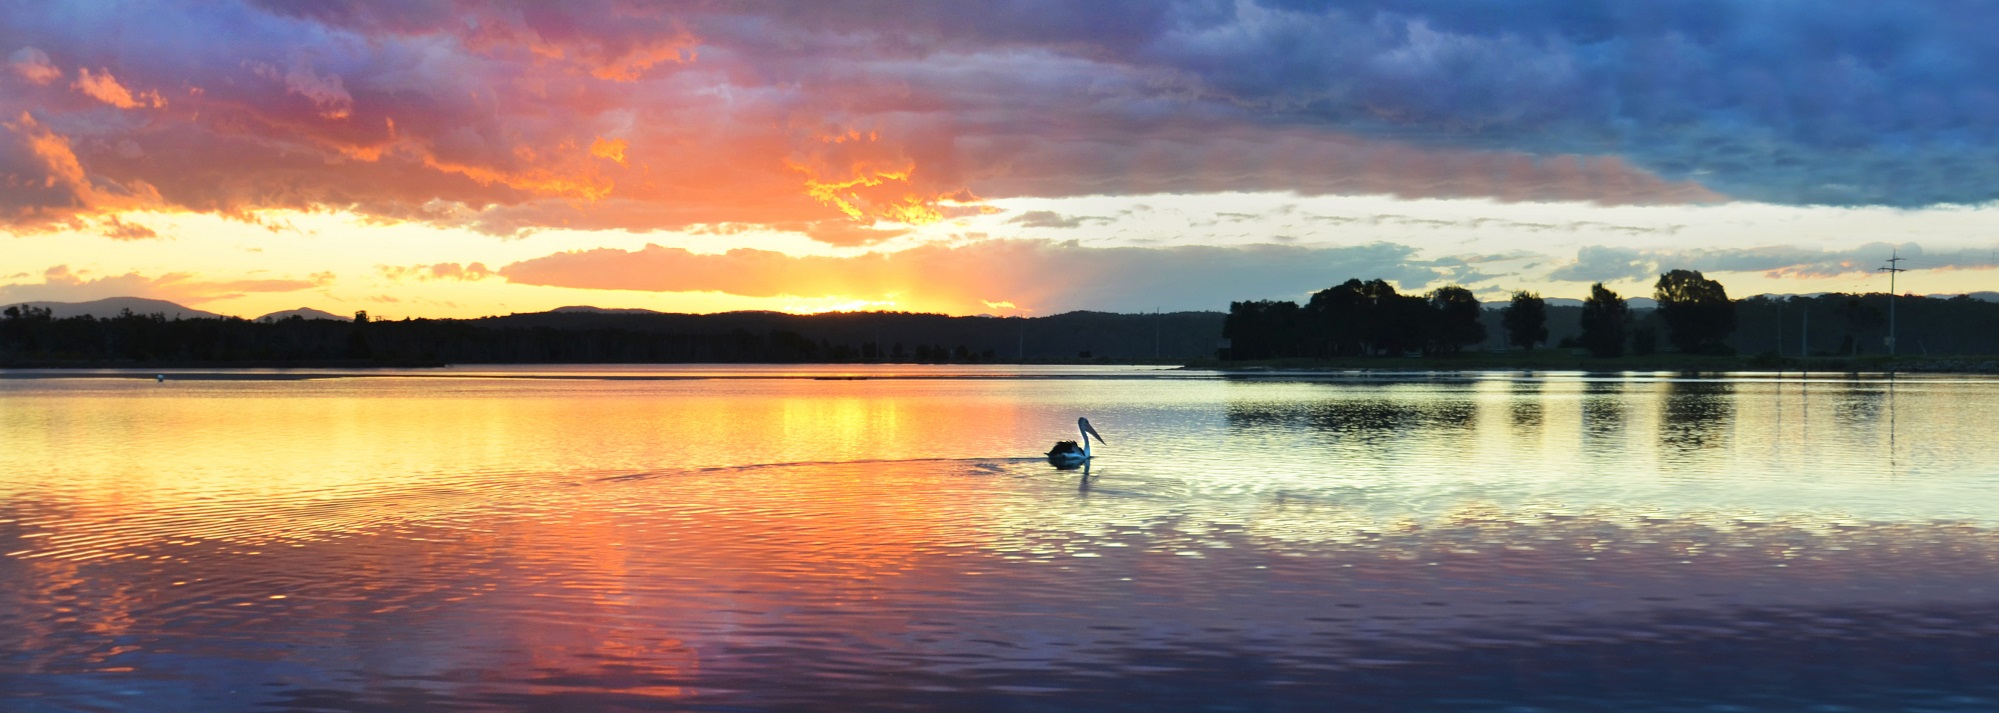 B&S - page banner lake & pelican.jpg